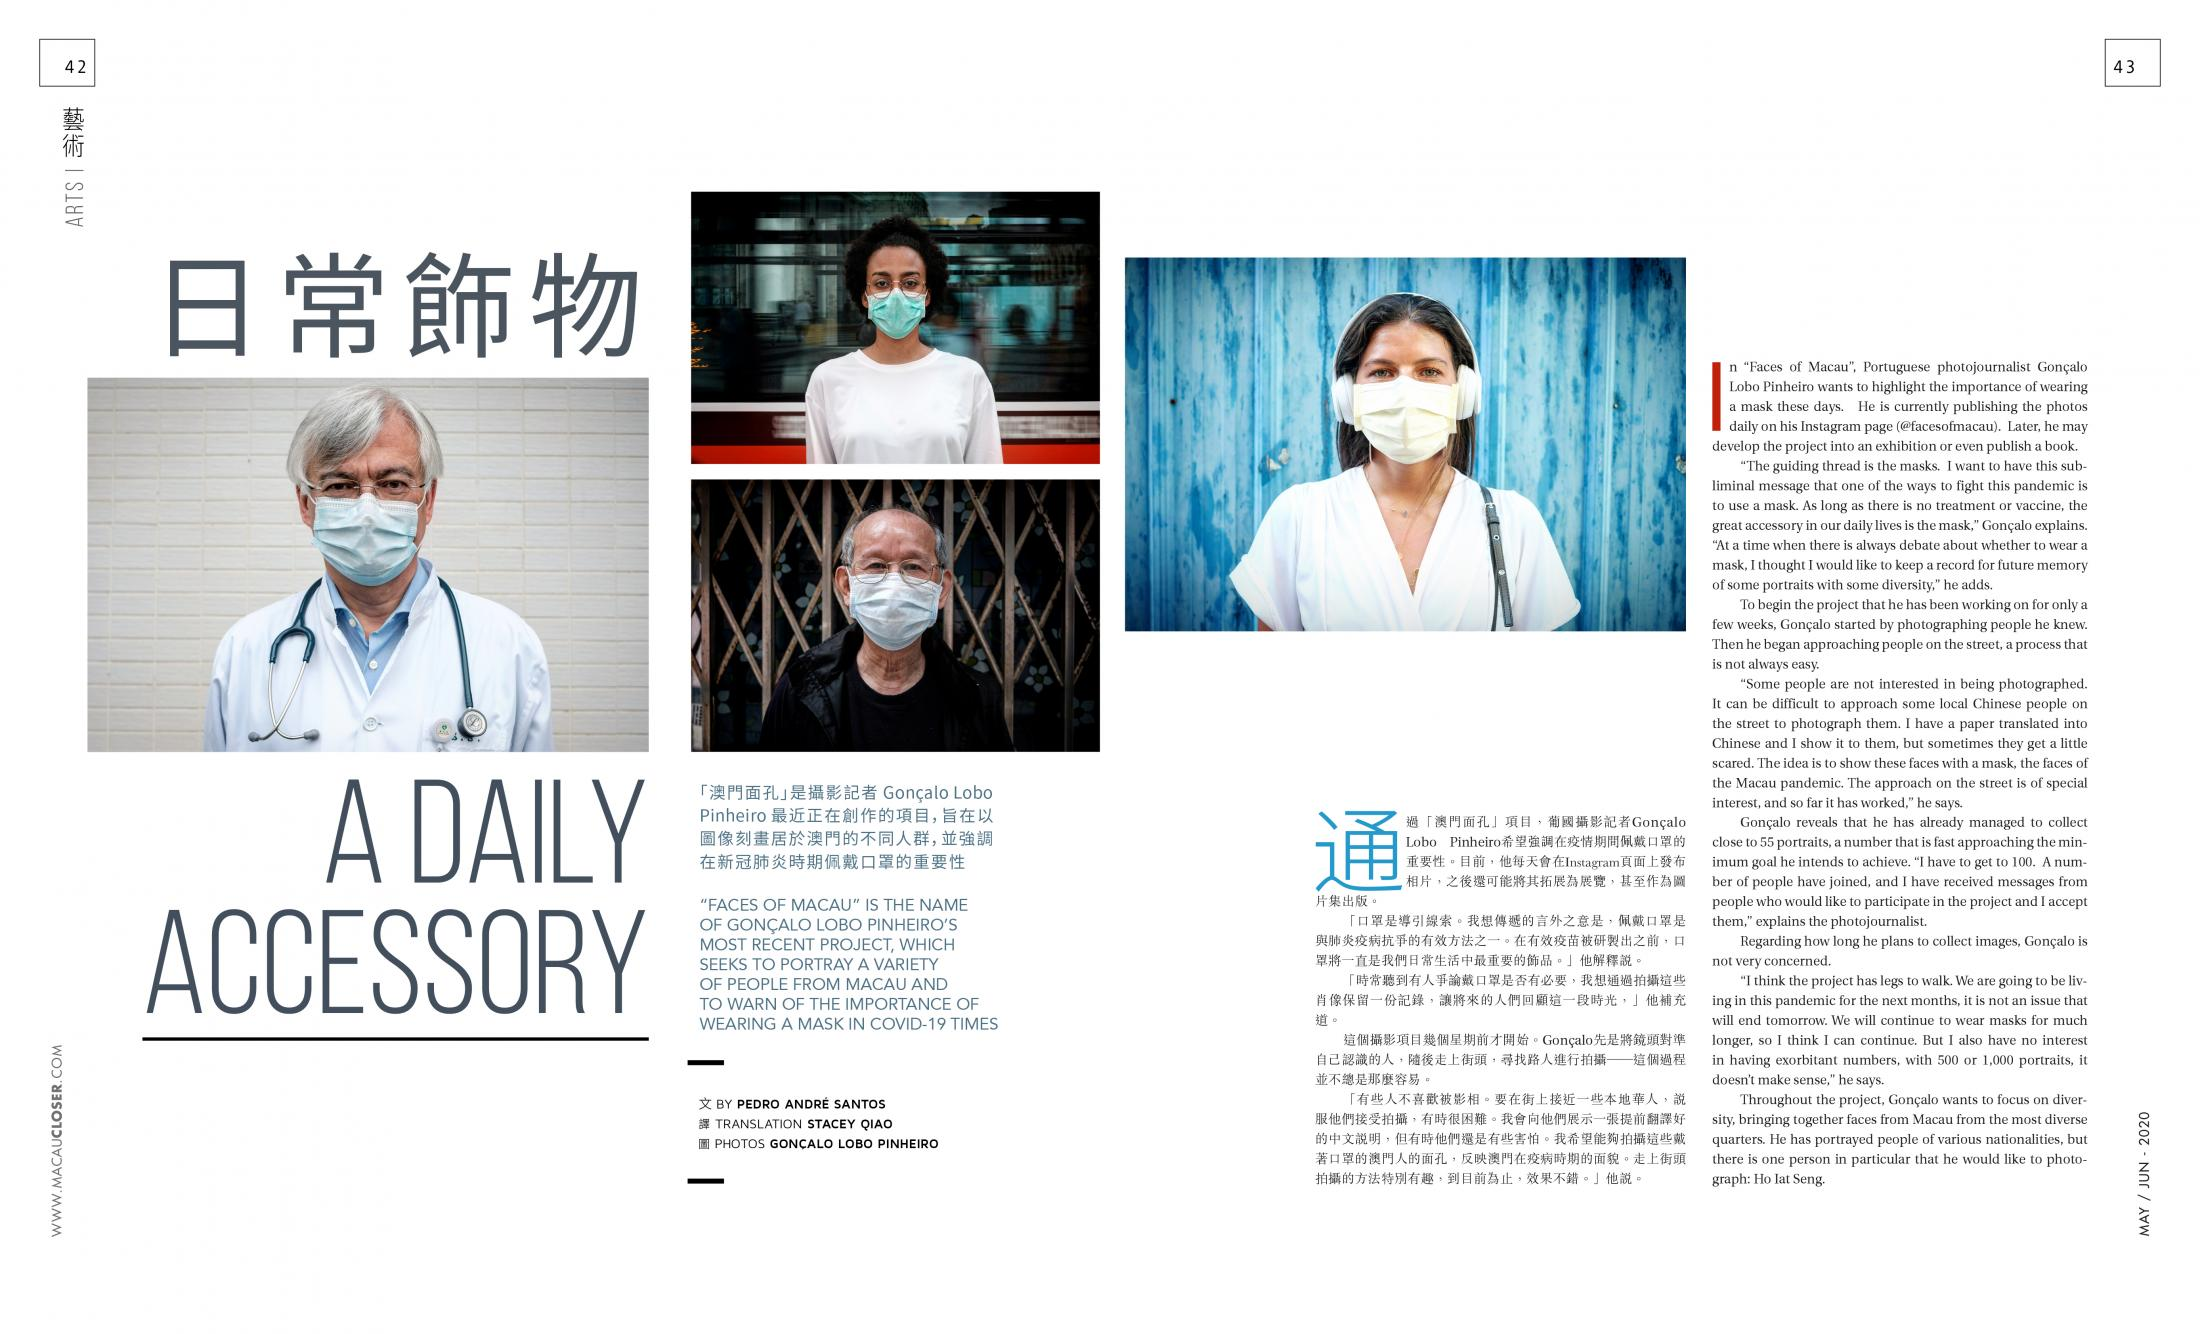 Art and Documentary Photography - Loading 01_Macau_Closer.jpg